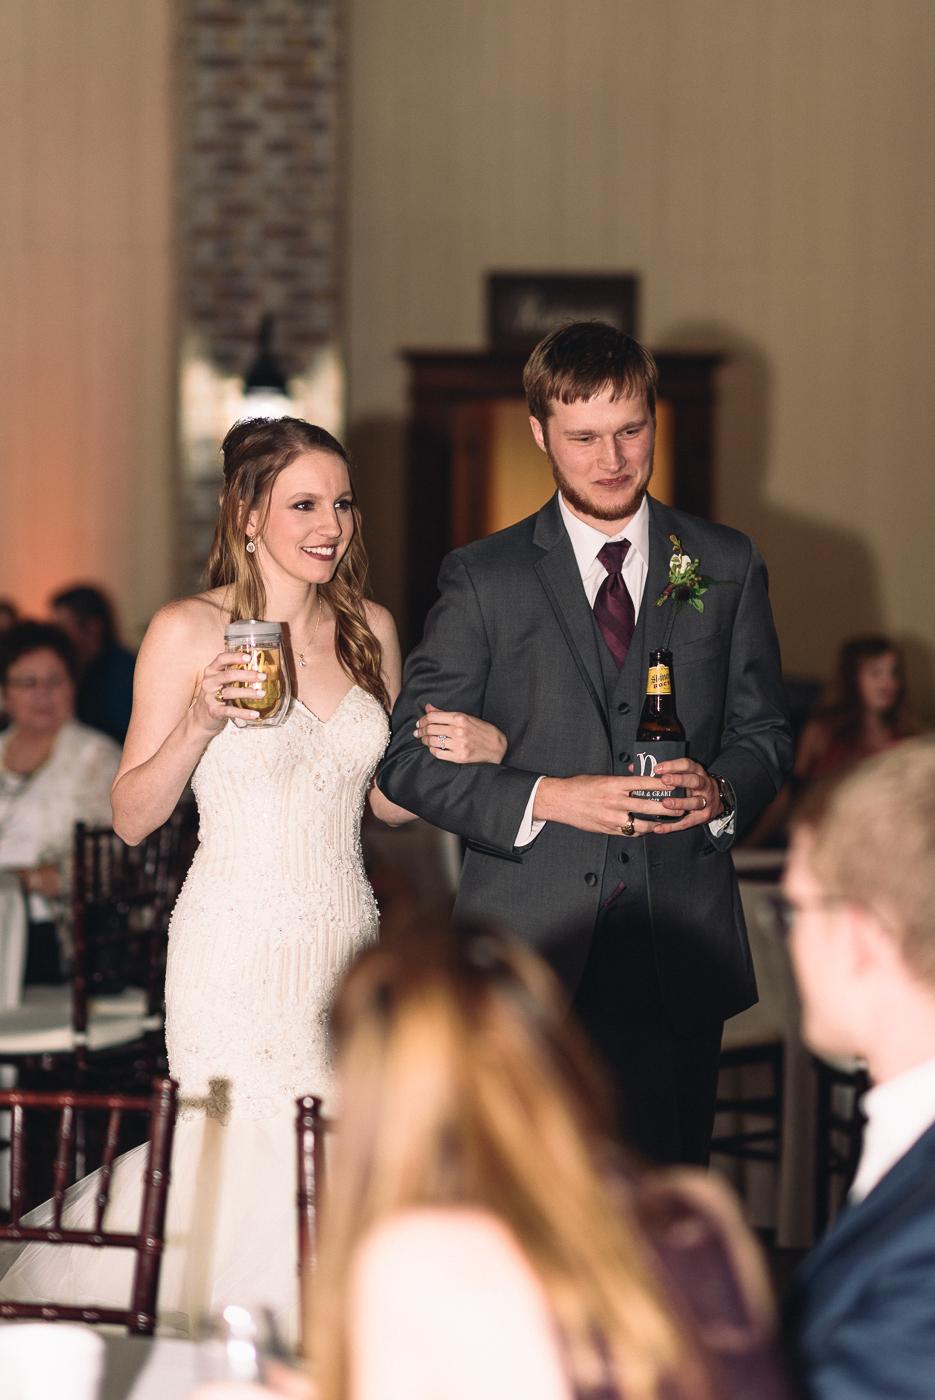 wedding reception speeches shiner bock beer wine sippy cup